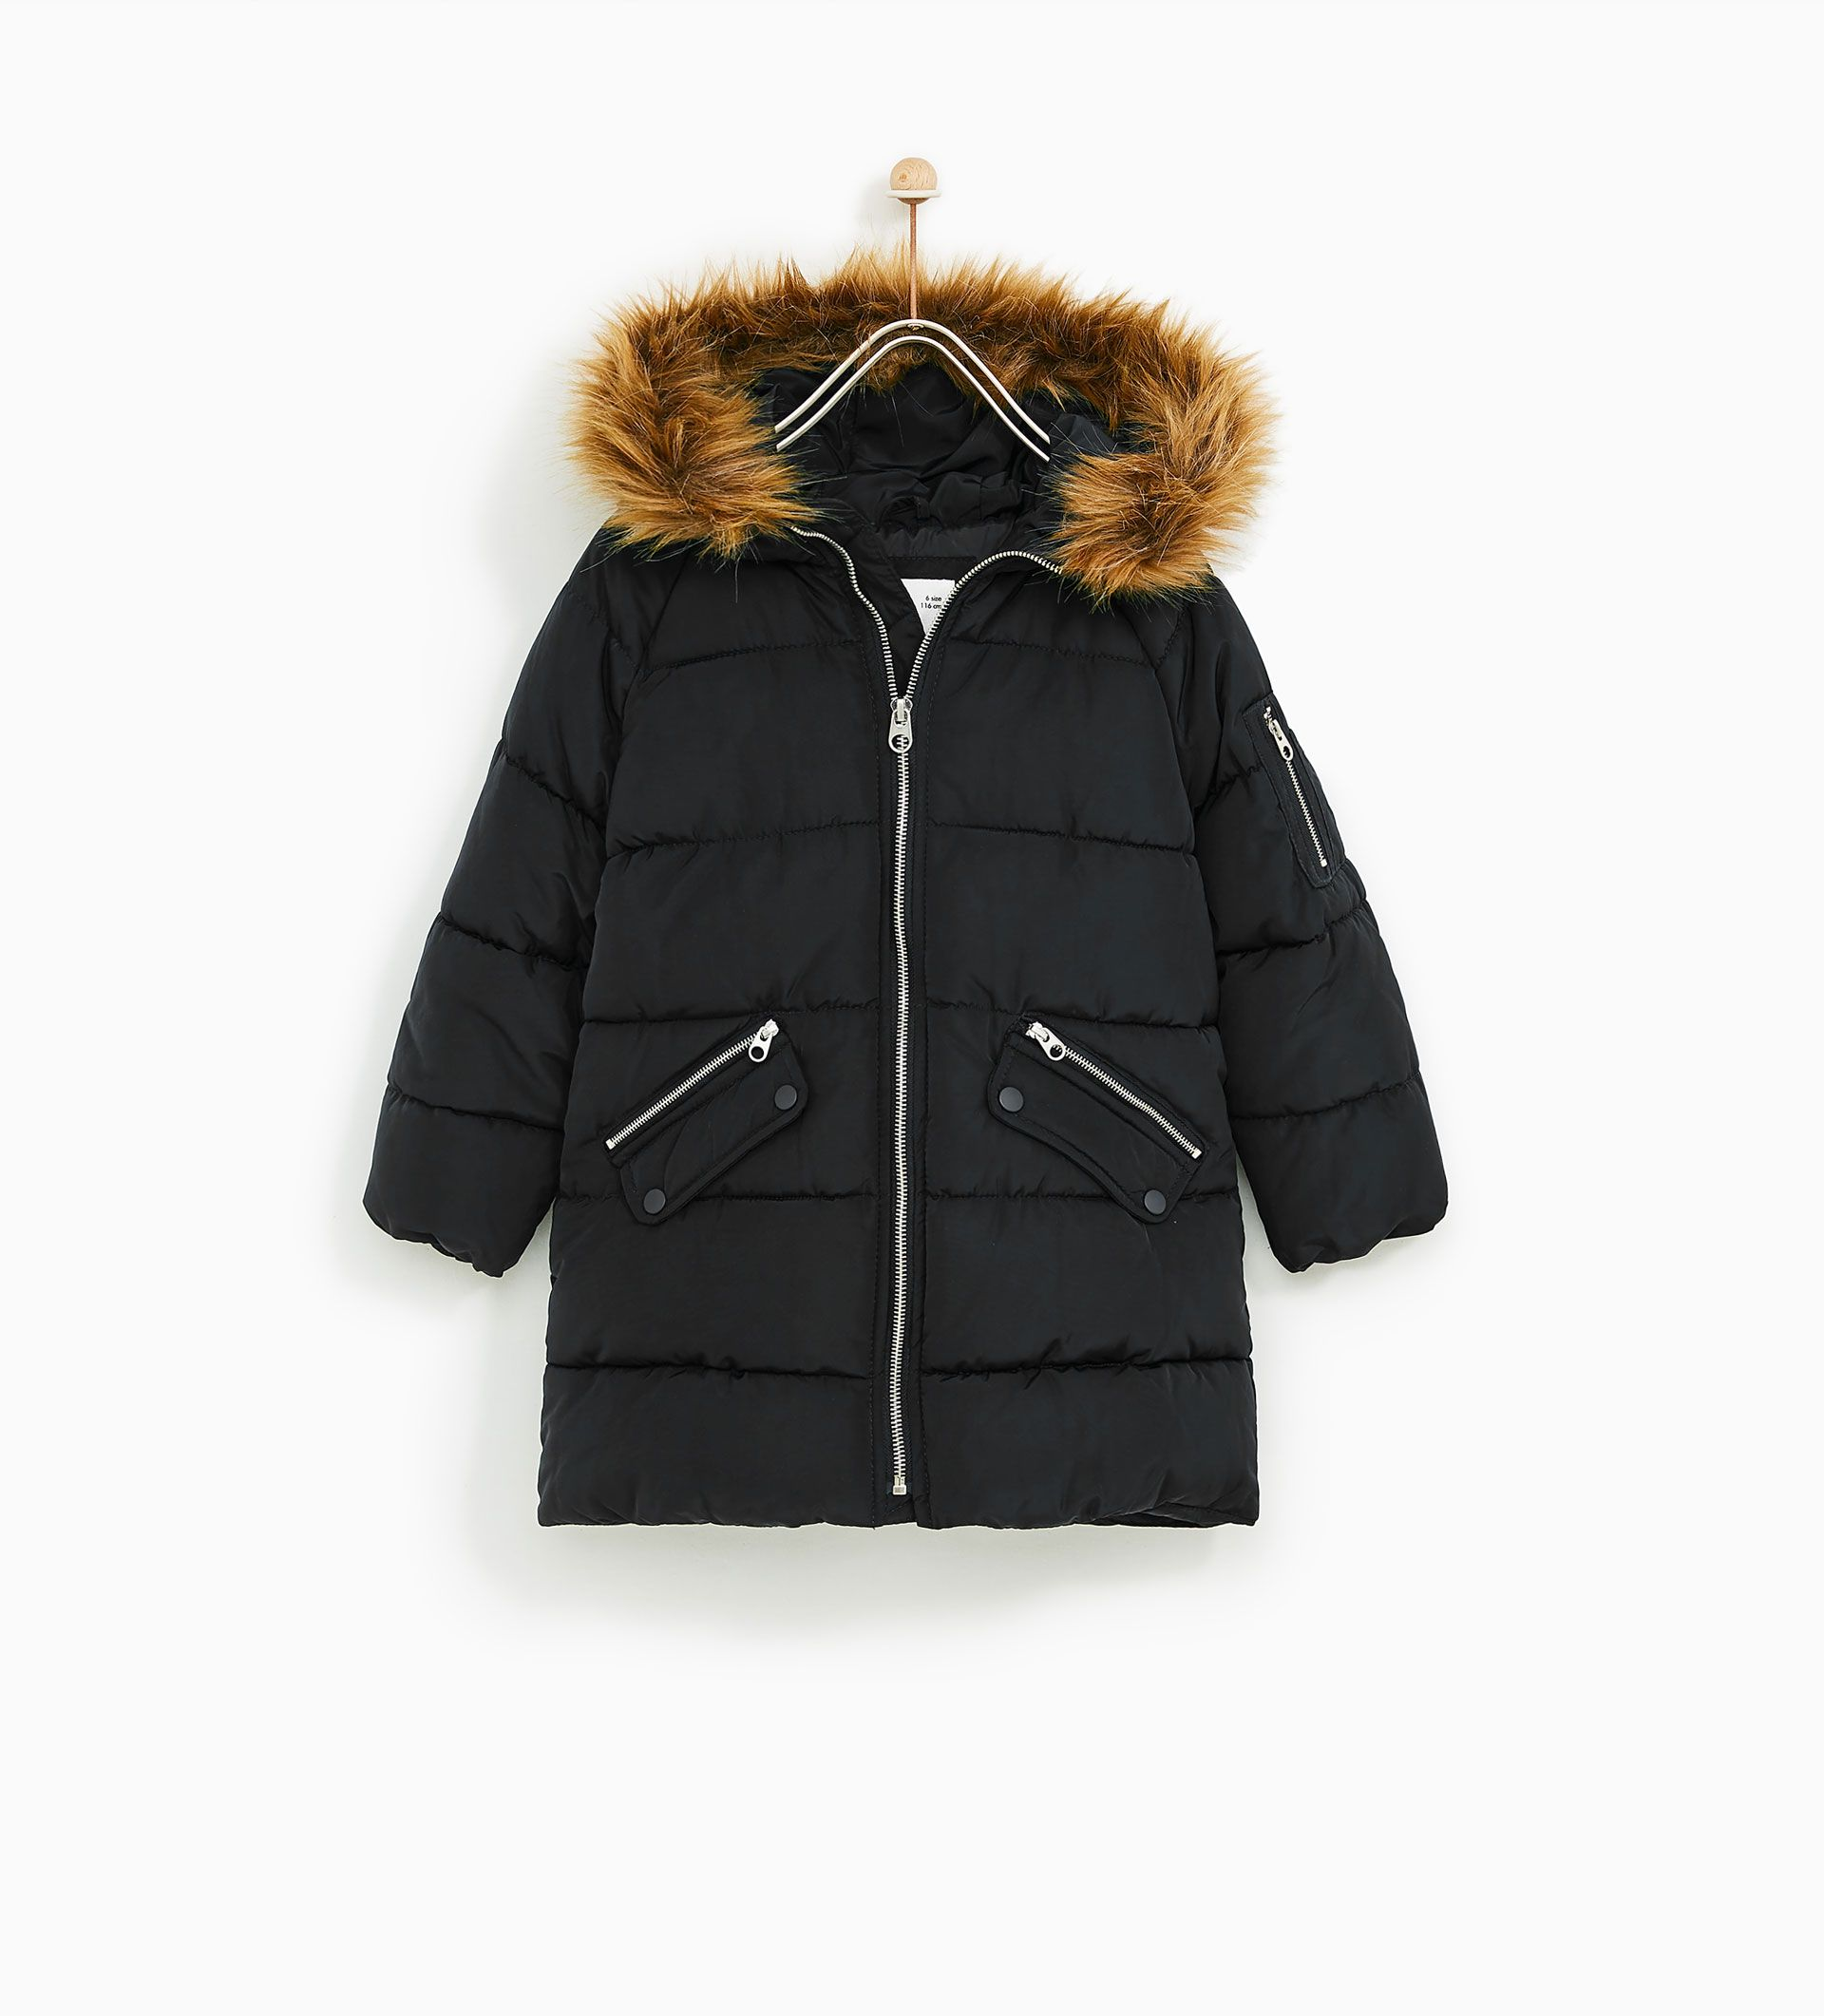 Hood Puffer Kids Zara Coat With Faux Fur d5YxwxqB